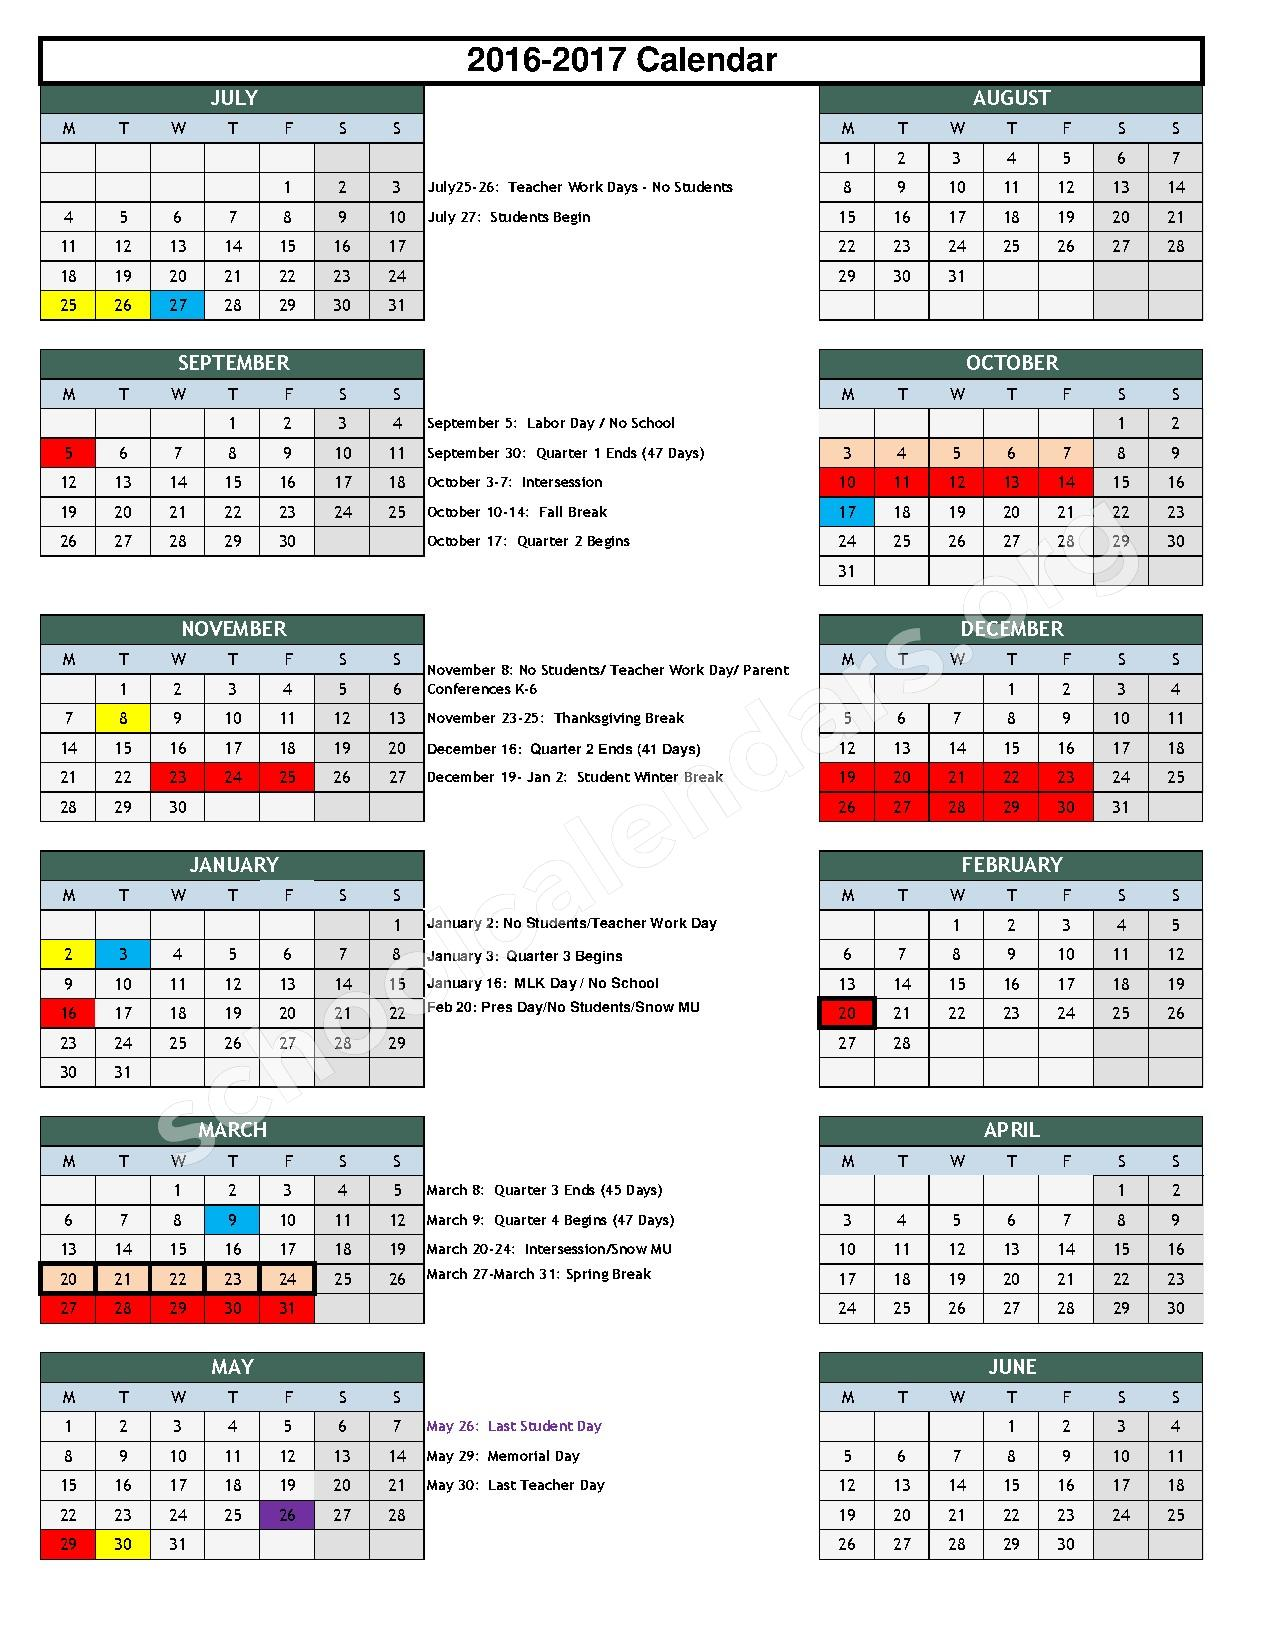 2016 - 2017 School Calendar – Charles Allen Prosser School of Technology – page 1